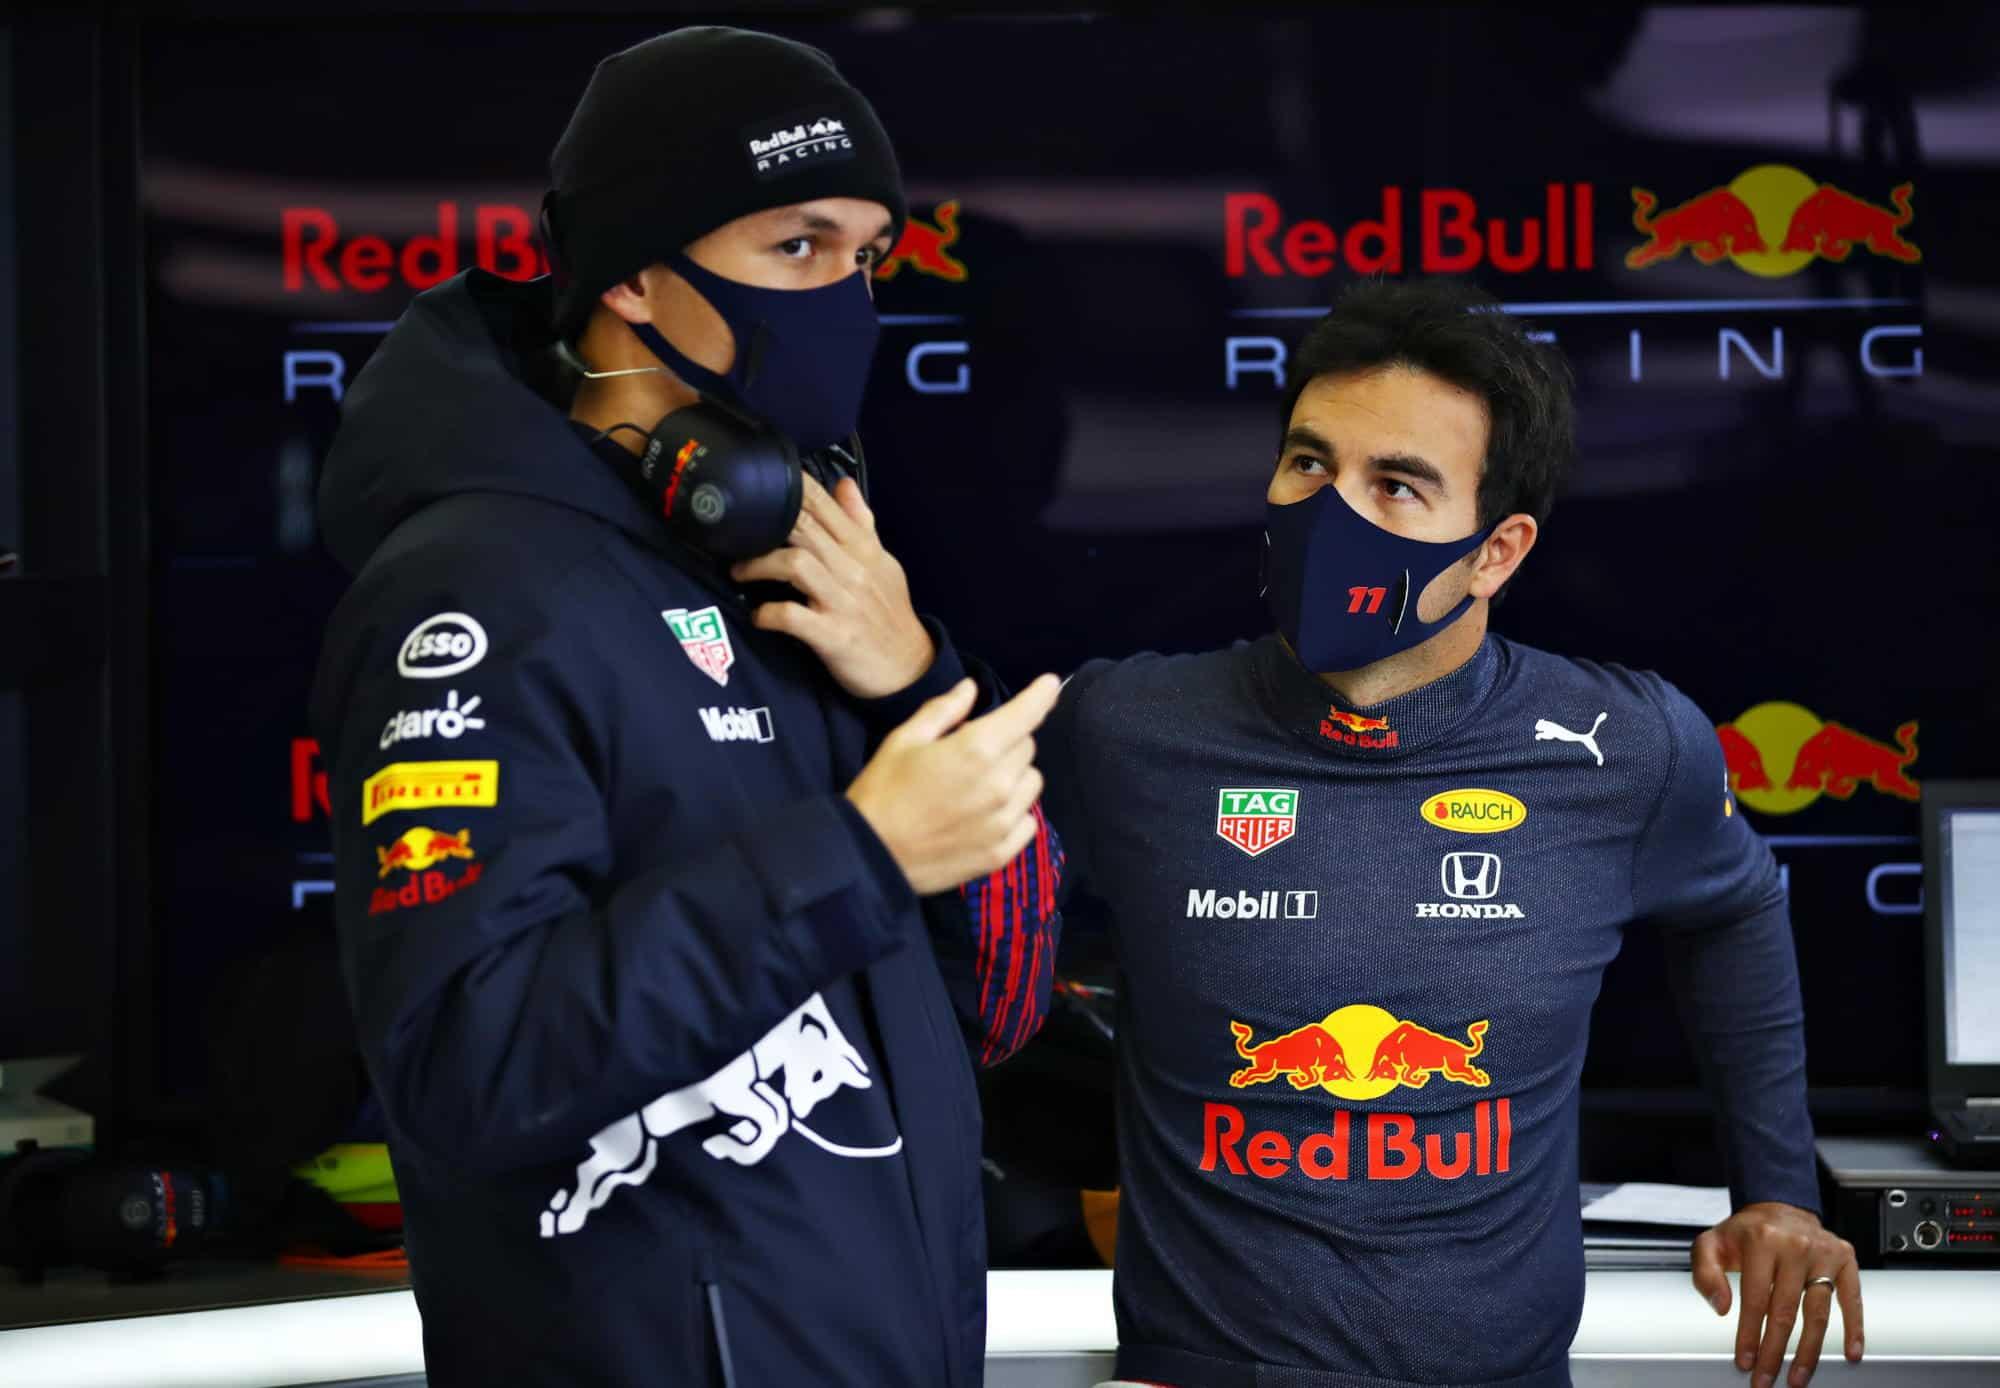 2021 Perez and Albon Red Bull garage Photo Red Bull